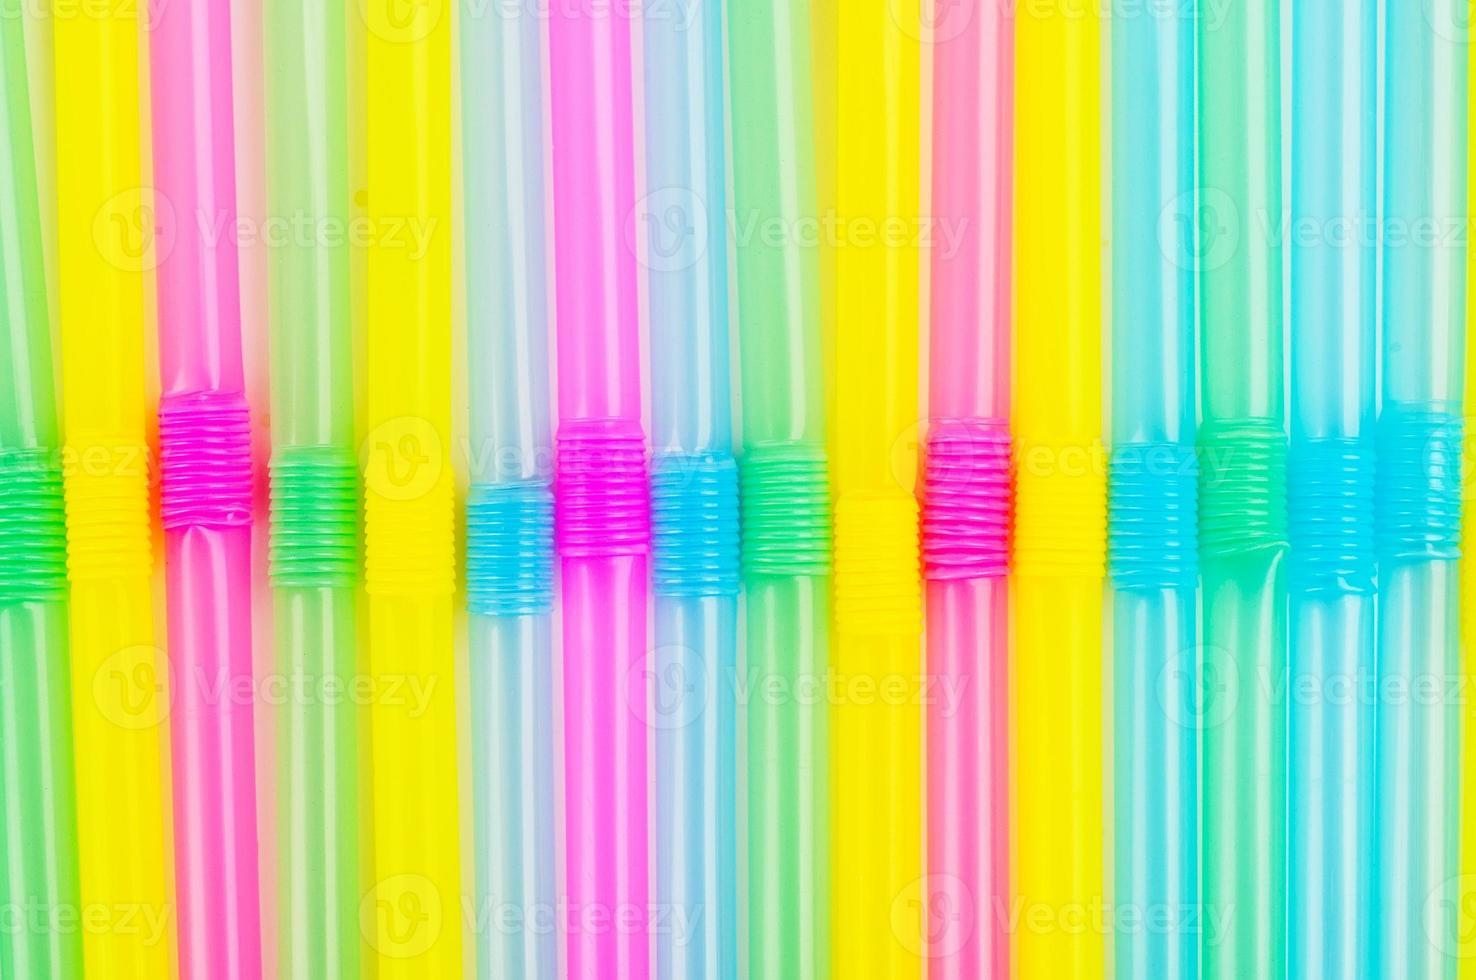 Drinking straws background photo